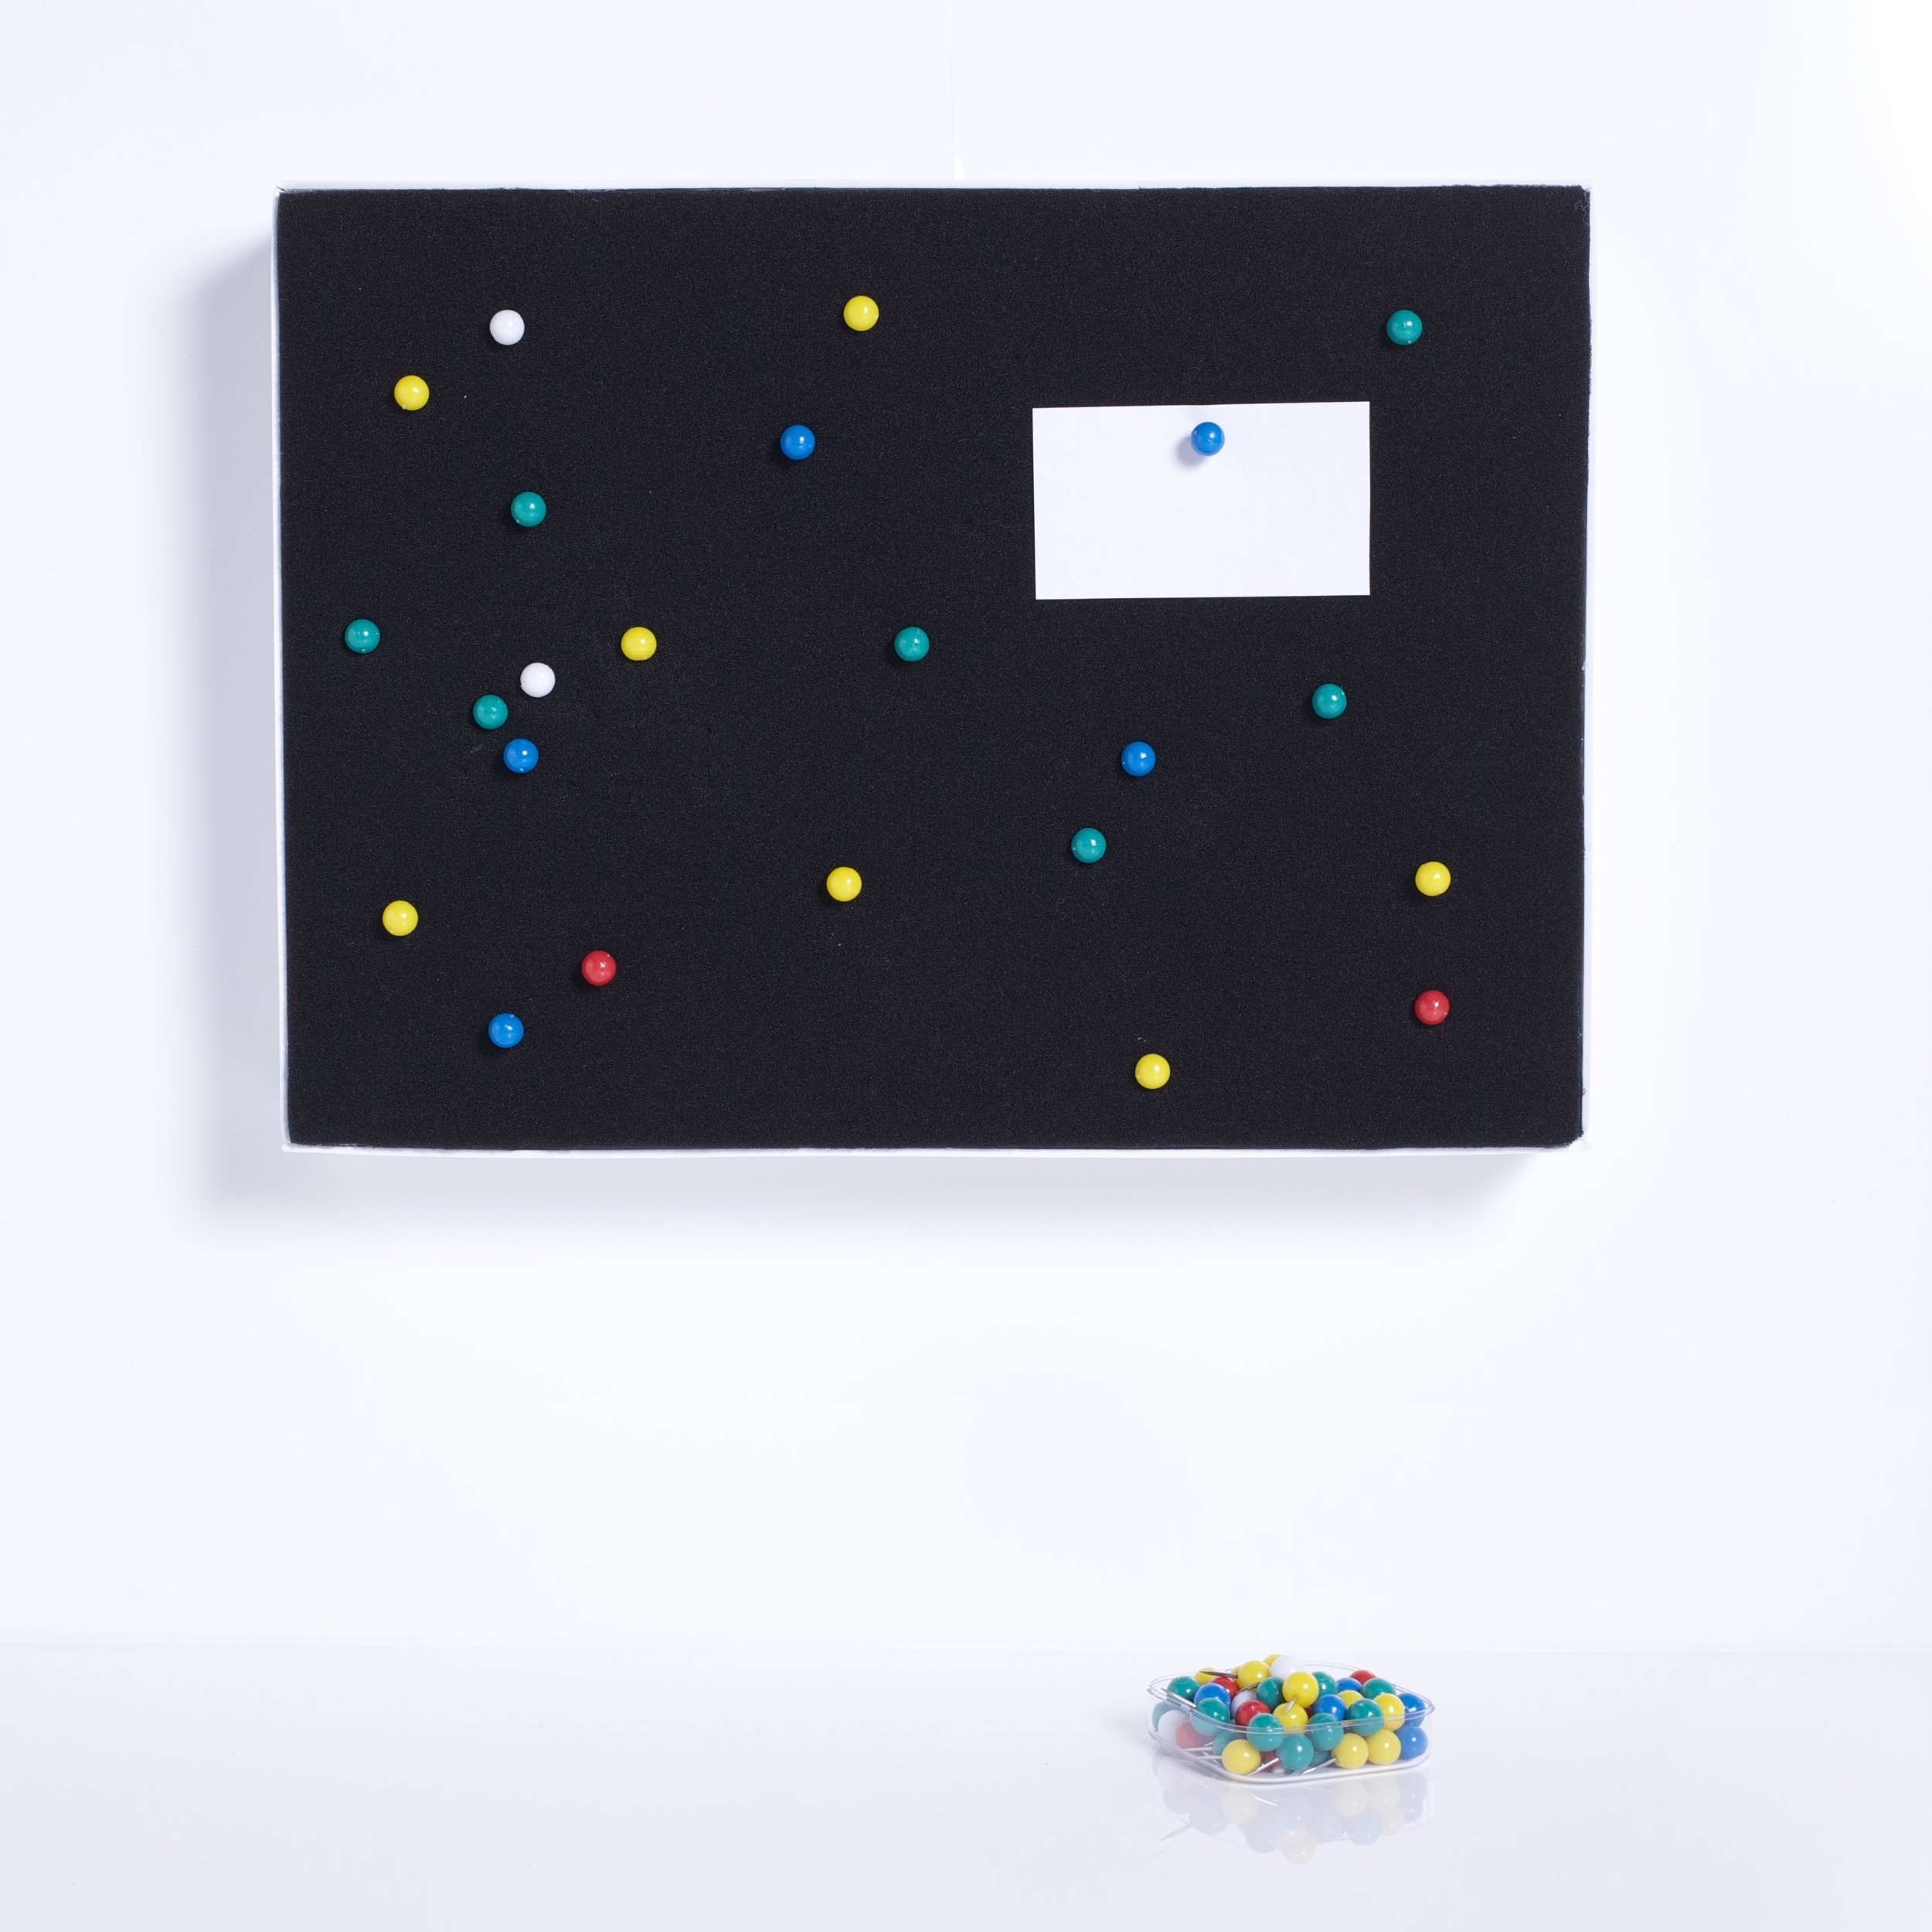 Billboard - Macbook Pro box